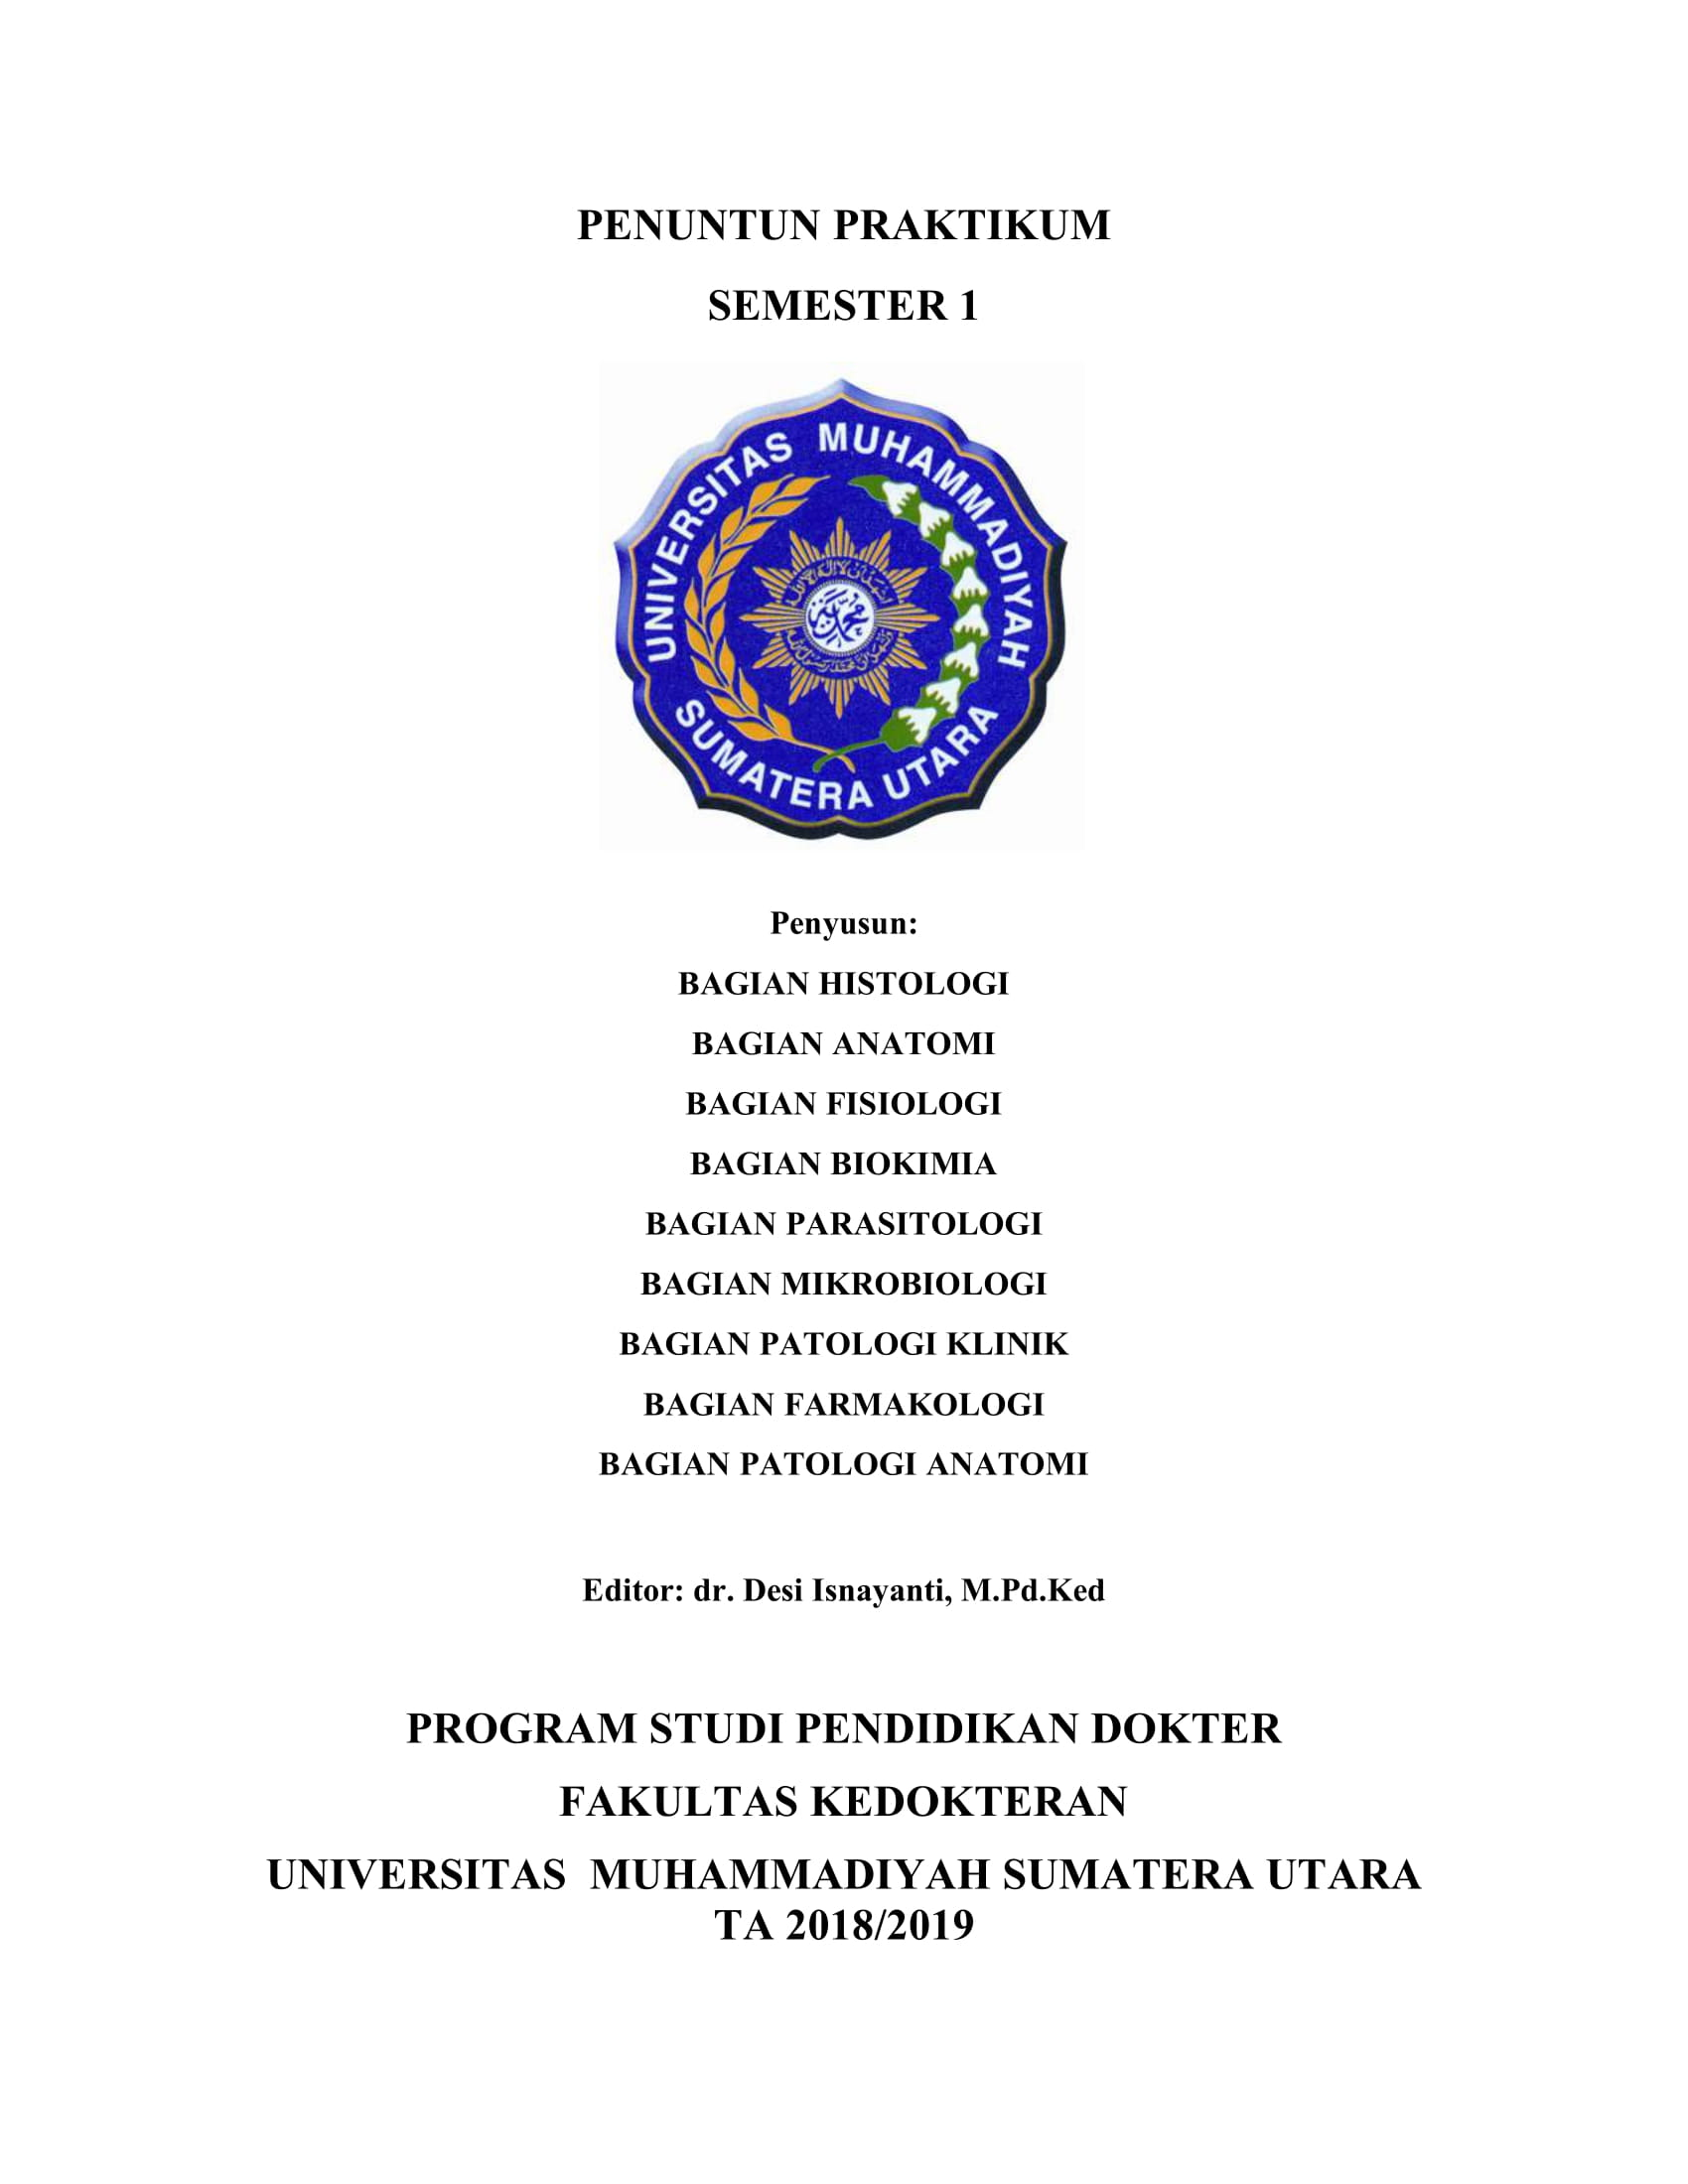 Panduan Praktikum Semester 1 2018-2019